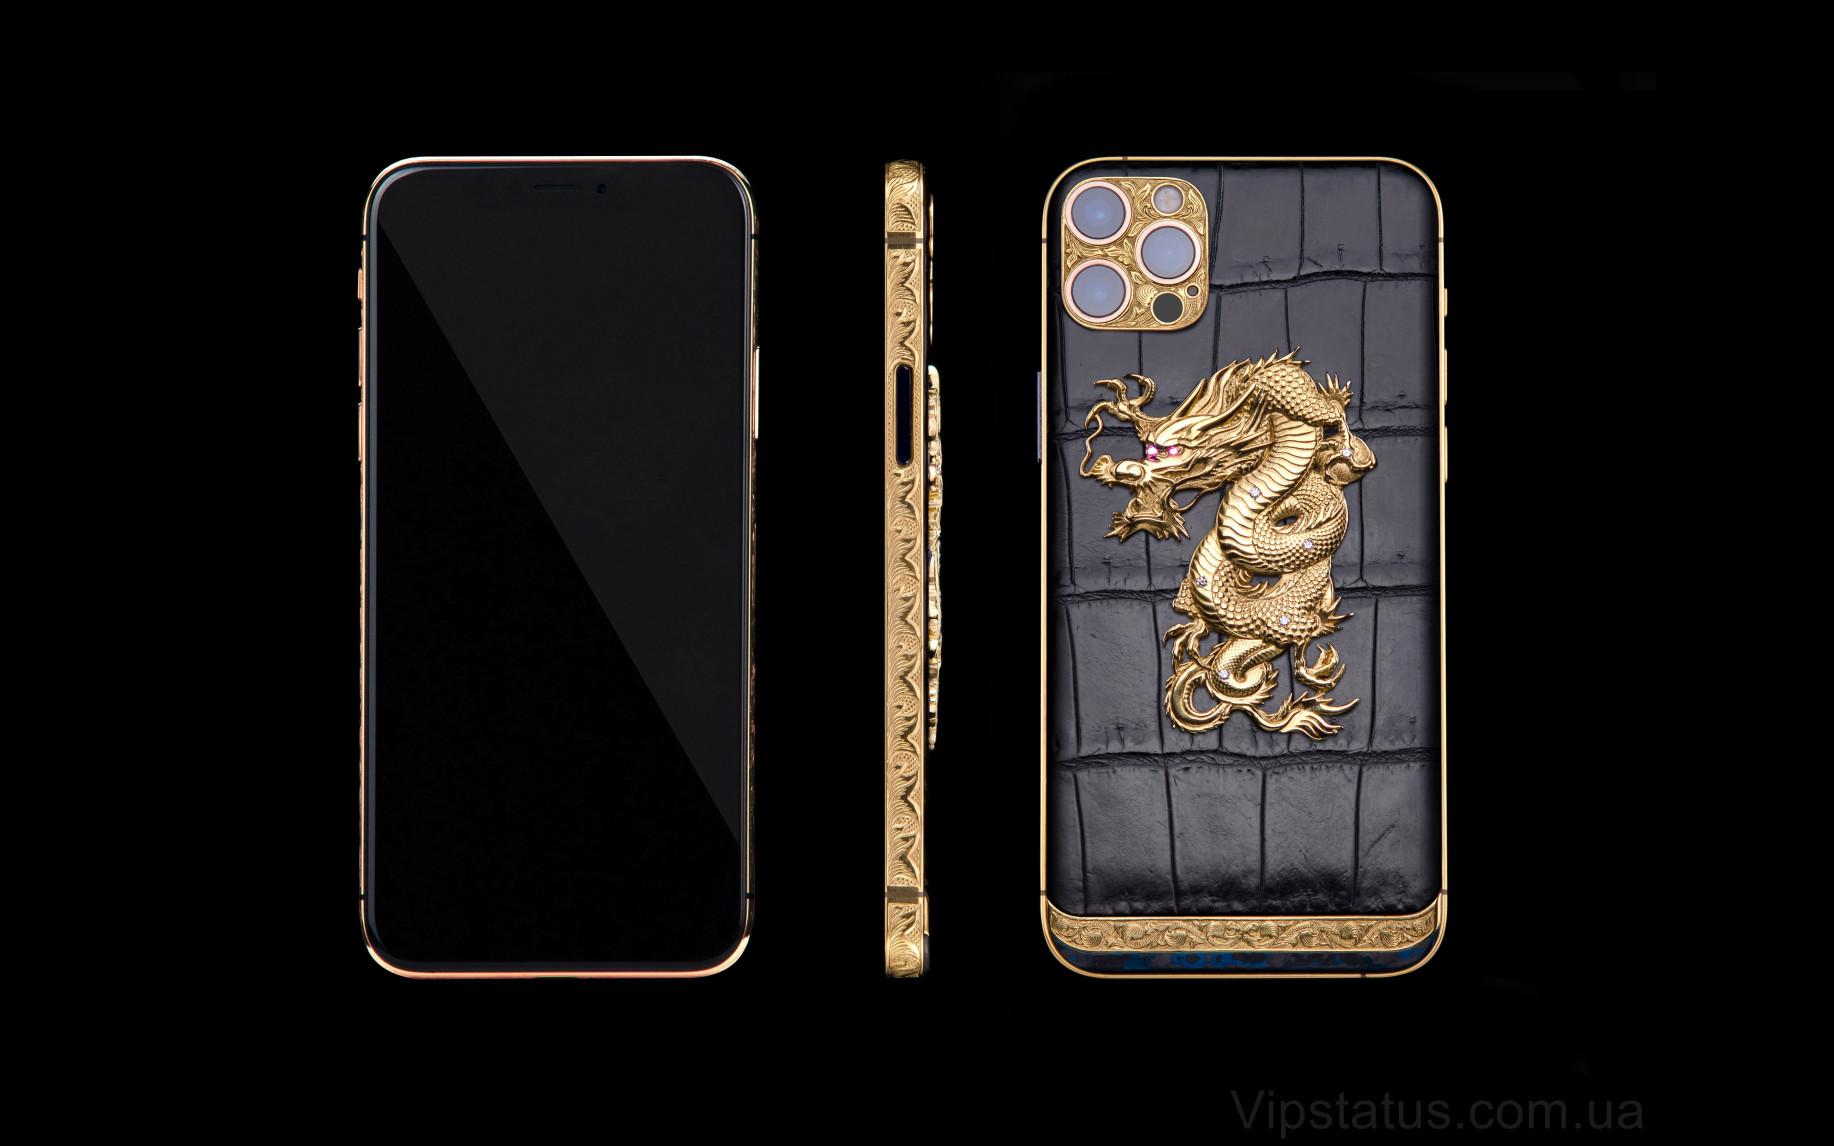 Elite Oriental Dragon IPHONE 12 PRO MAX 512 GB Oriental Dragon IPHONE 12 PRO MAX 512 GB image 30